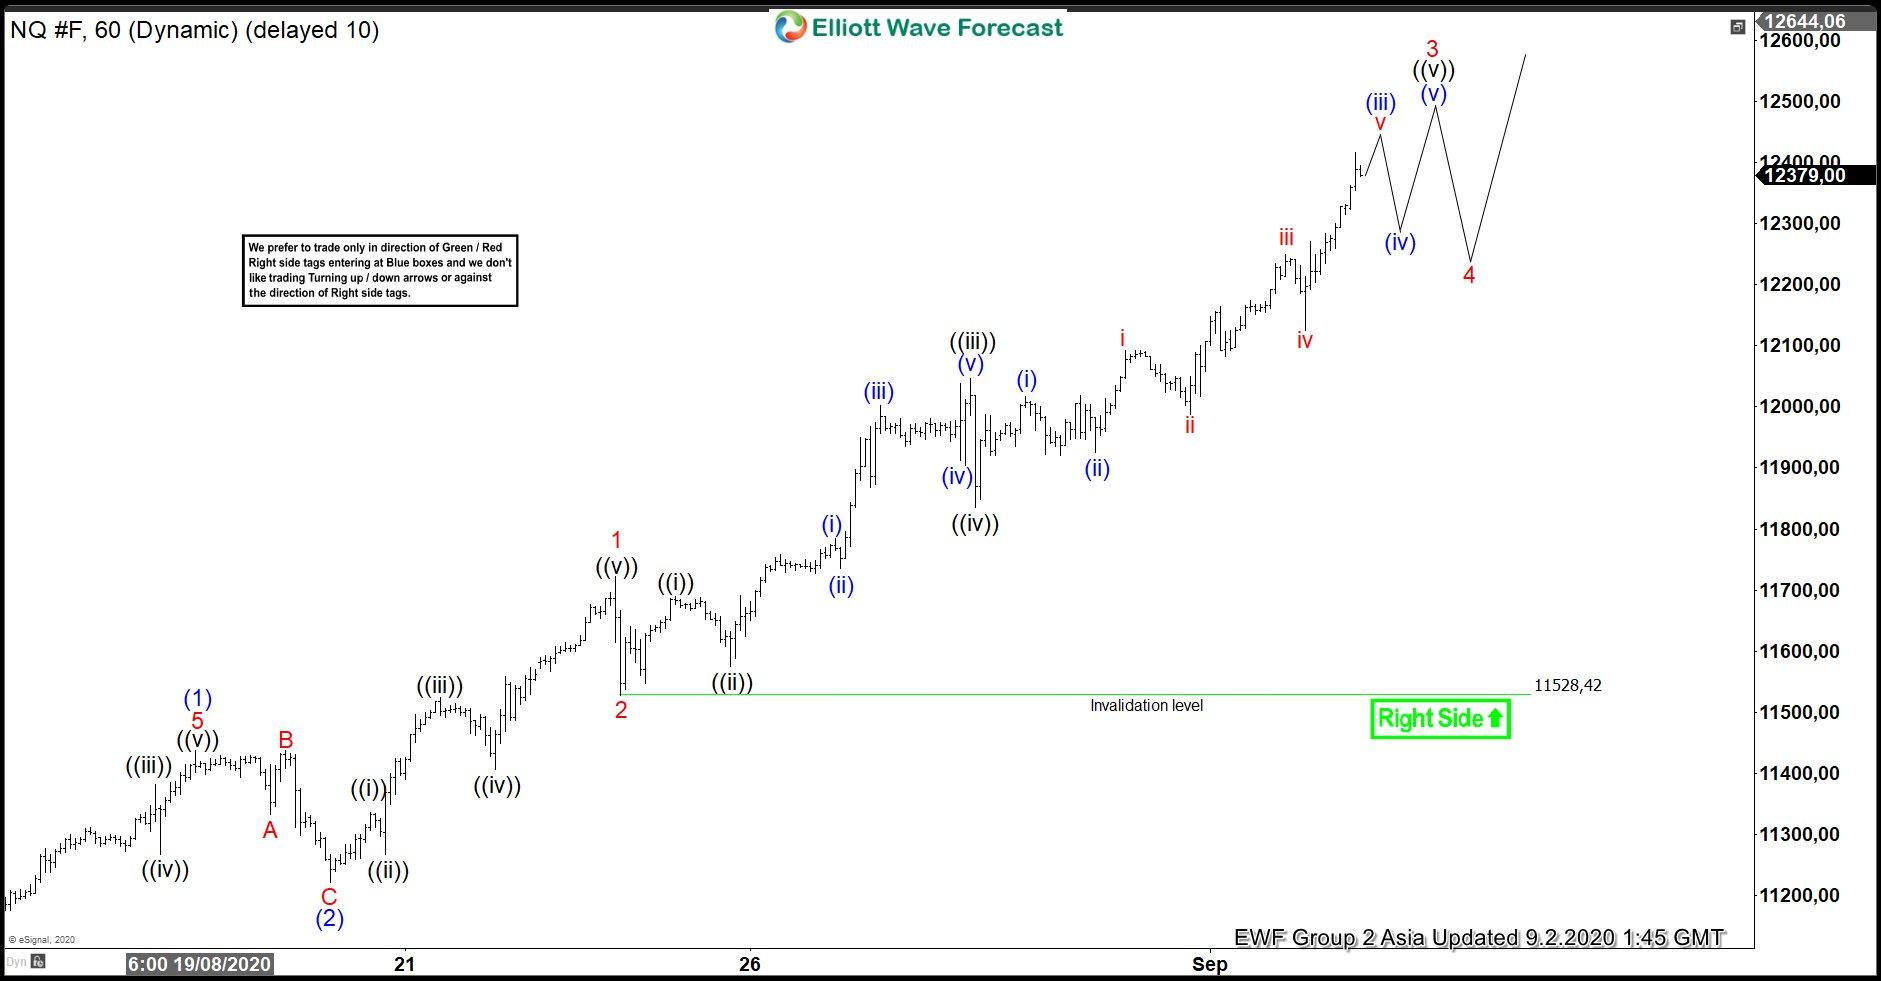 Elliott Wave View: Nasdaq (NQ) Looking to Extend Higher